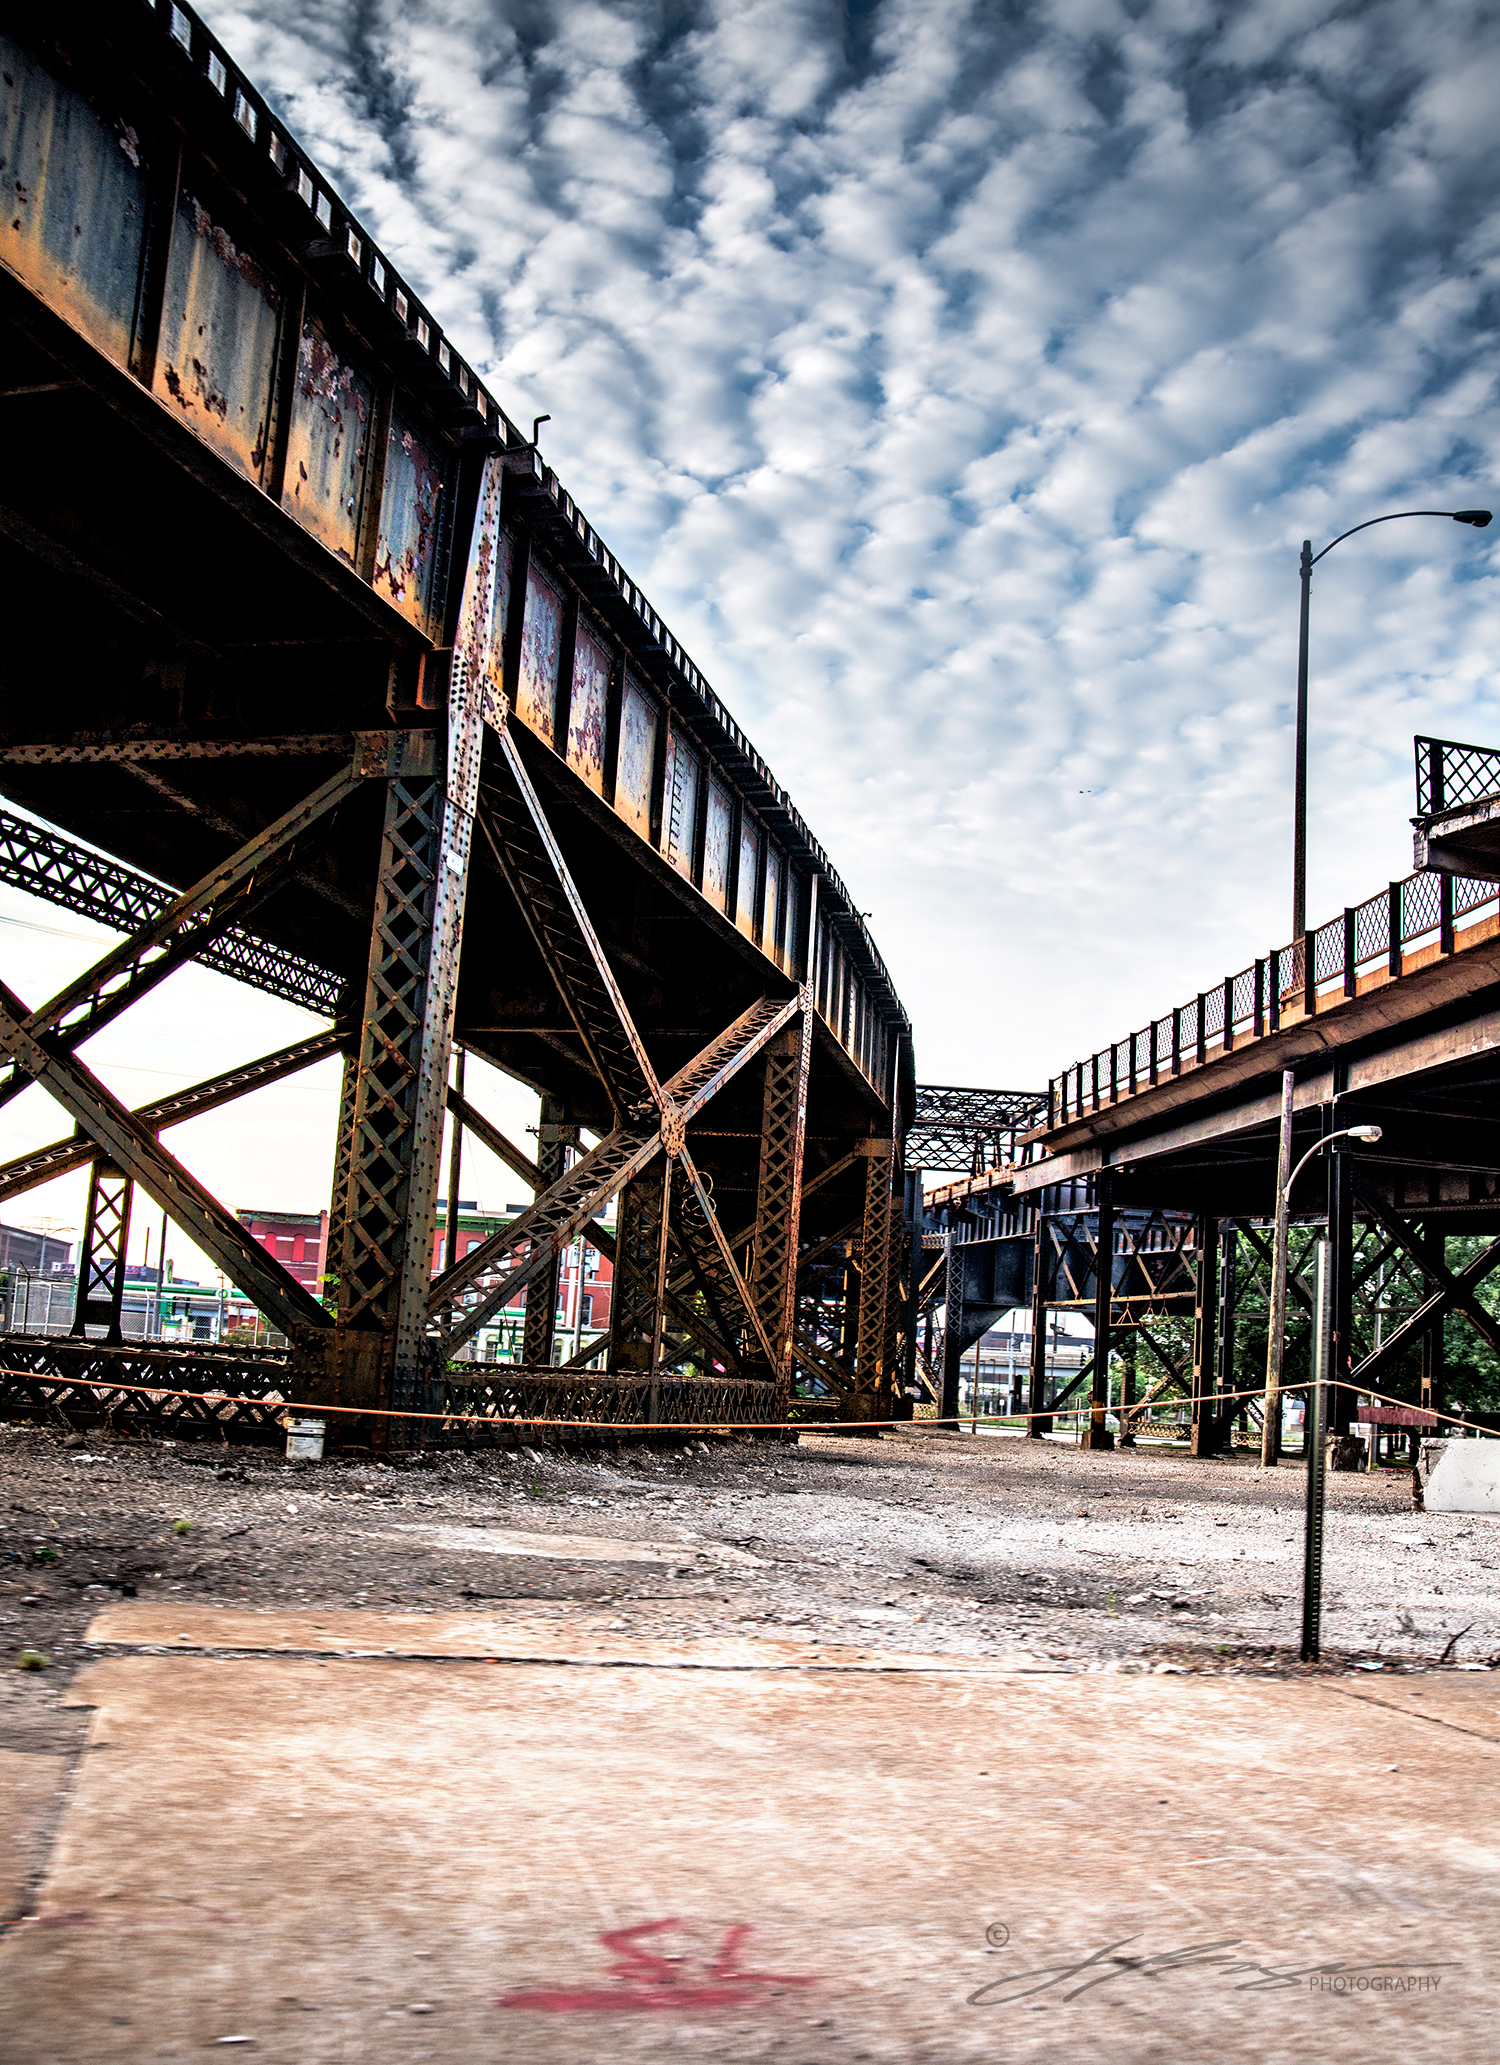 StLouis_MO_Urban Jungle_GridIron_travel_Travelphotography_jbogerphotography (10).jpg